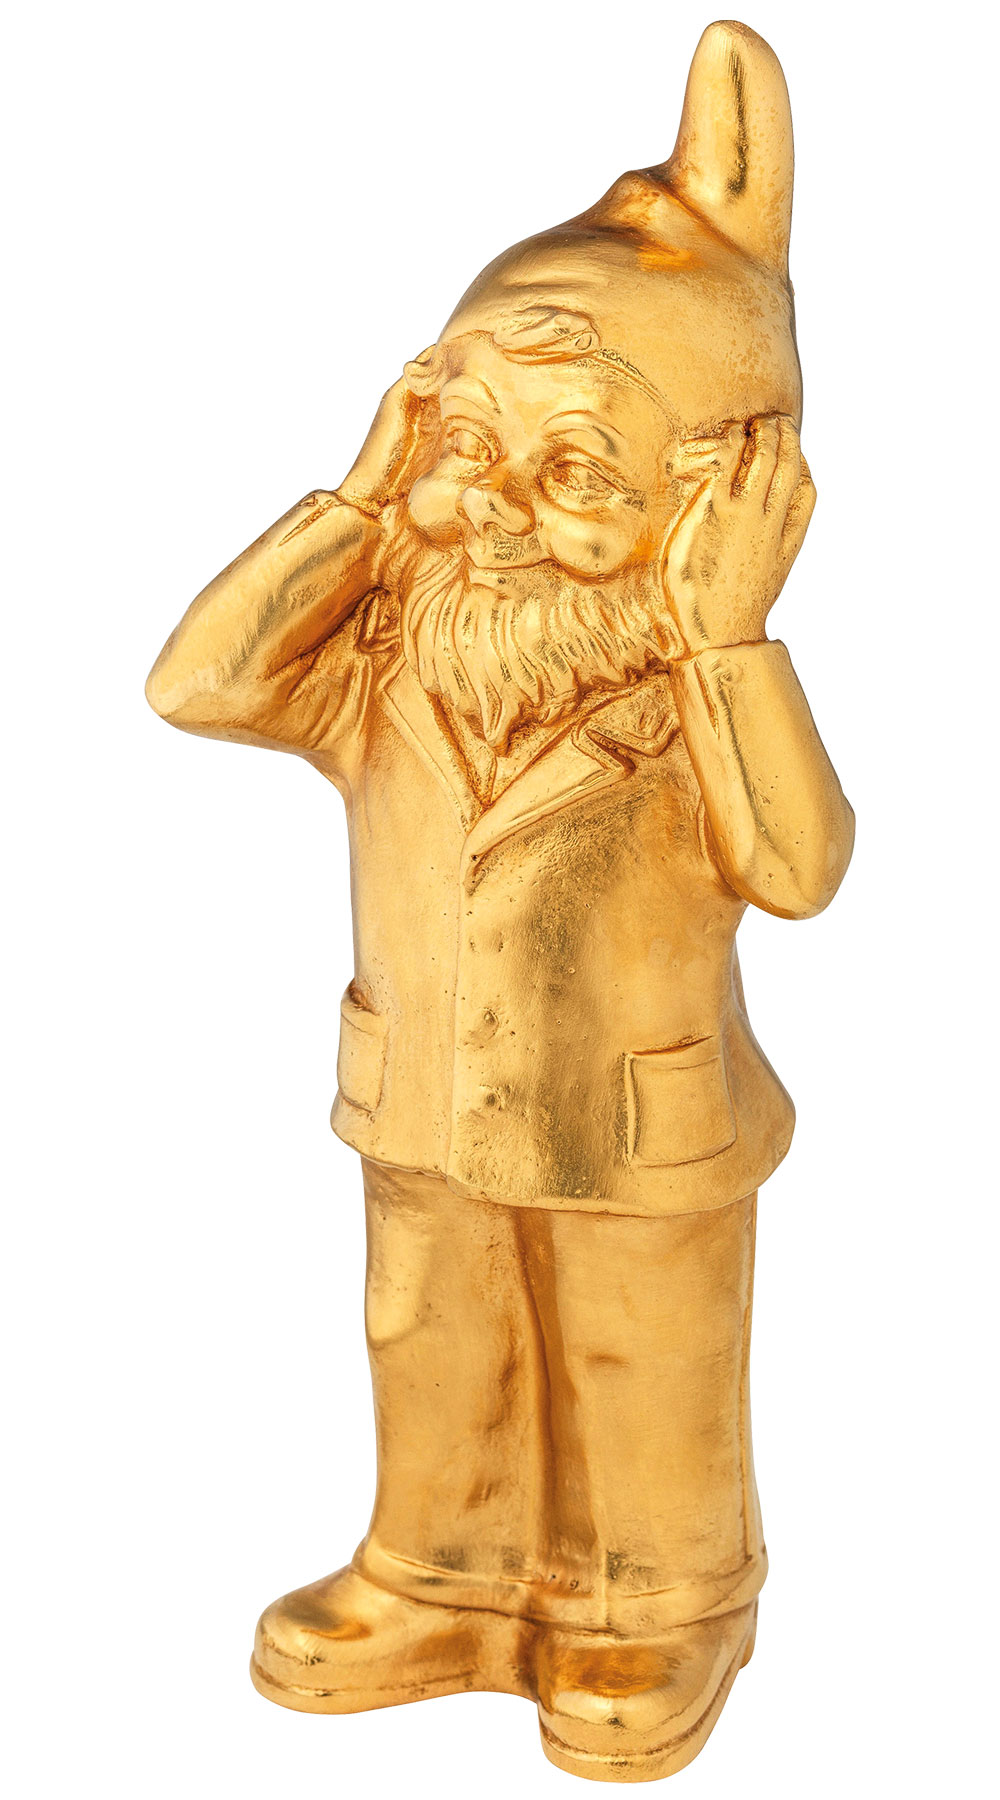 "Skulptur ""Geheimnisträger - Nichts hören"", Version vergoldet"